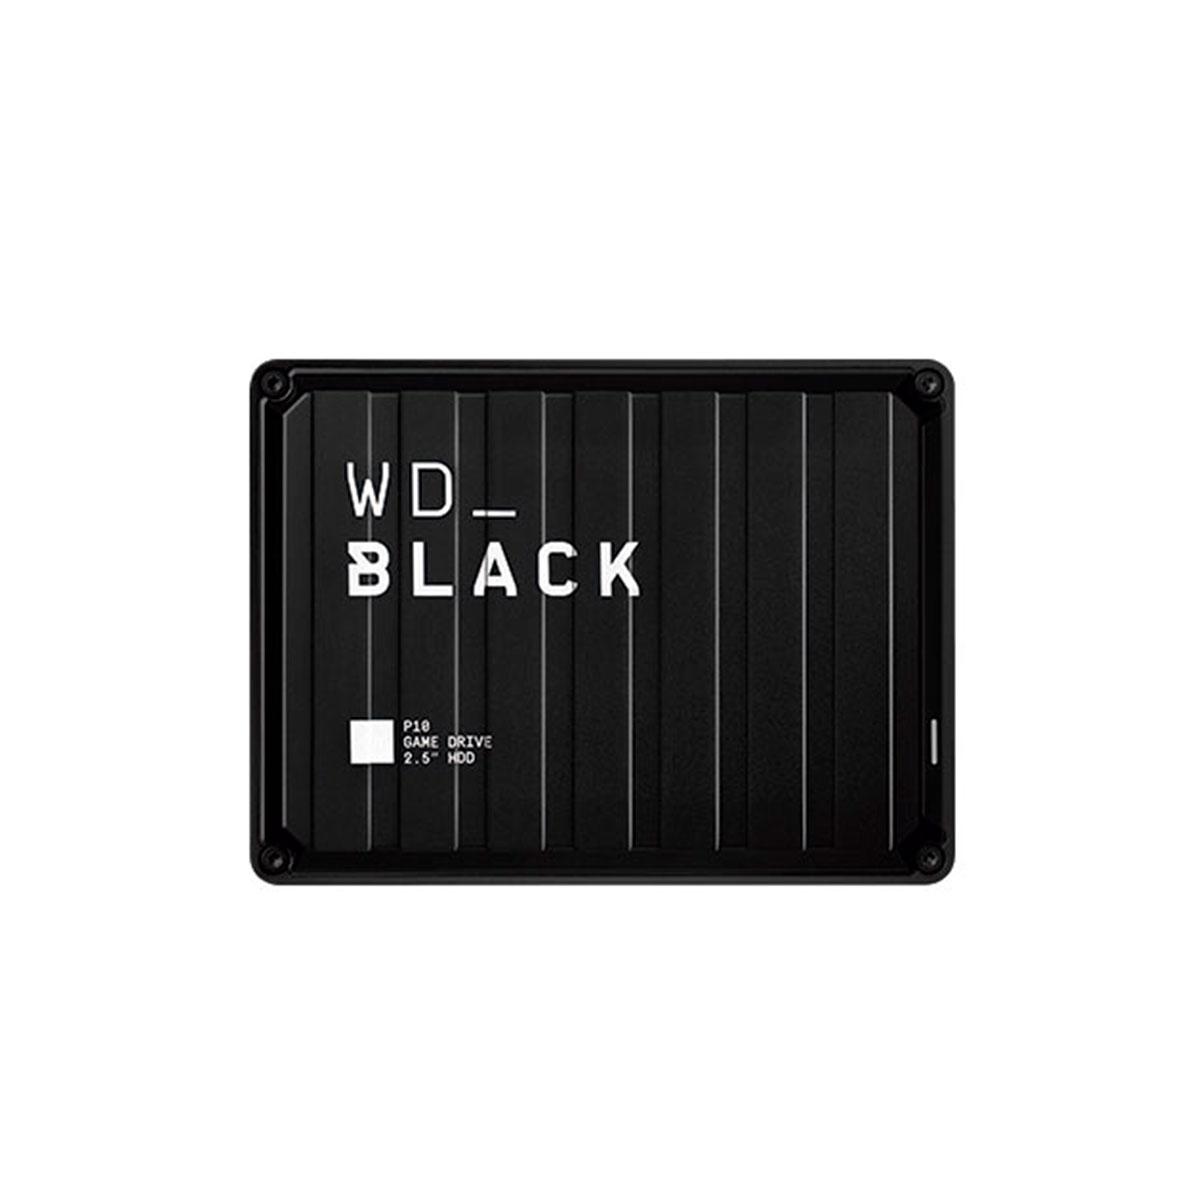 WD_BLACK_P10_COMBO